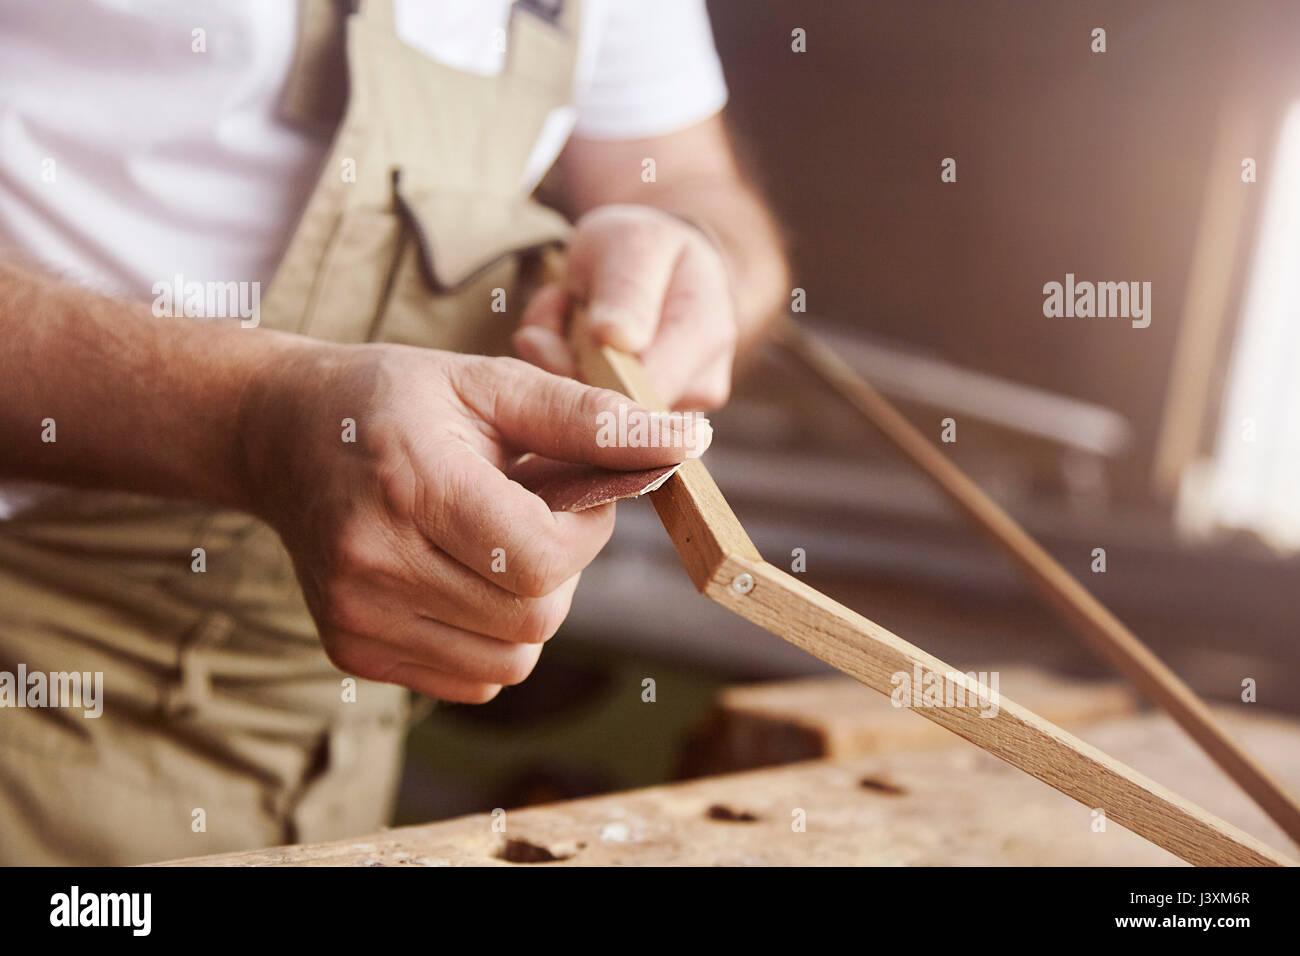 Hands of male carpenter sanding frame at workbench Stock Photo